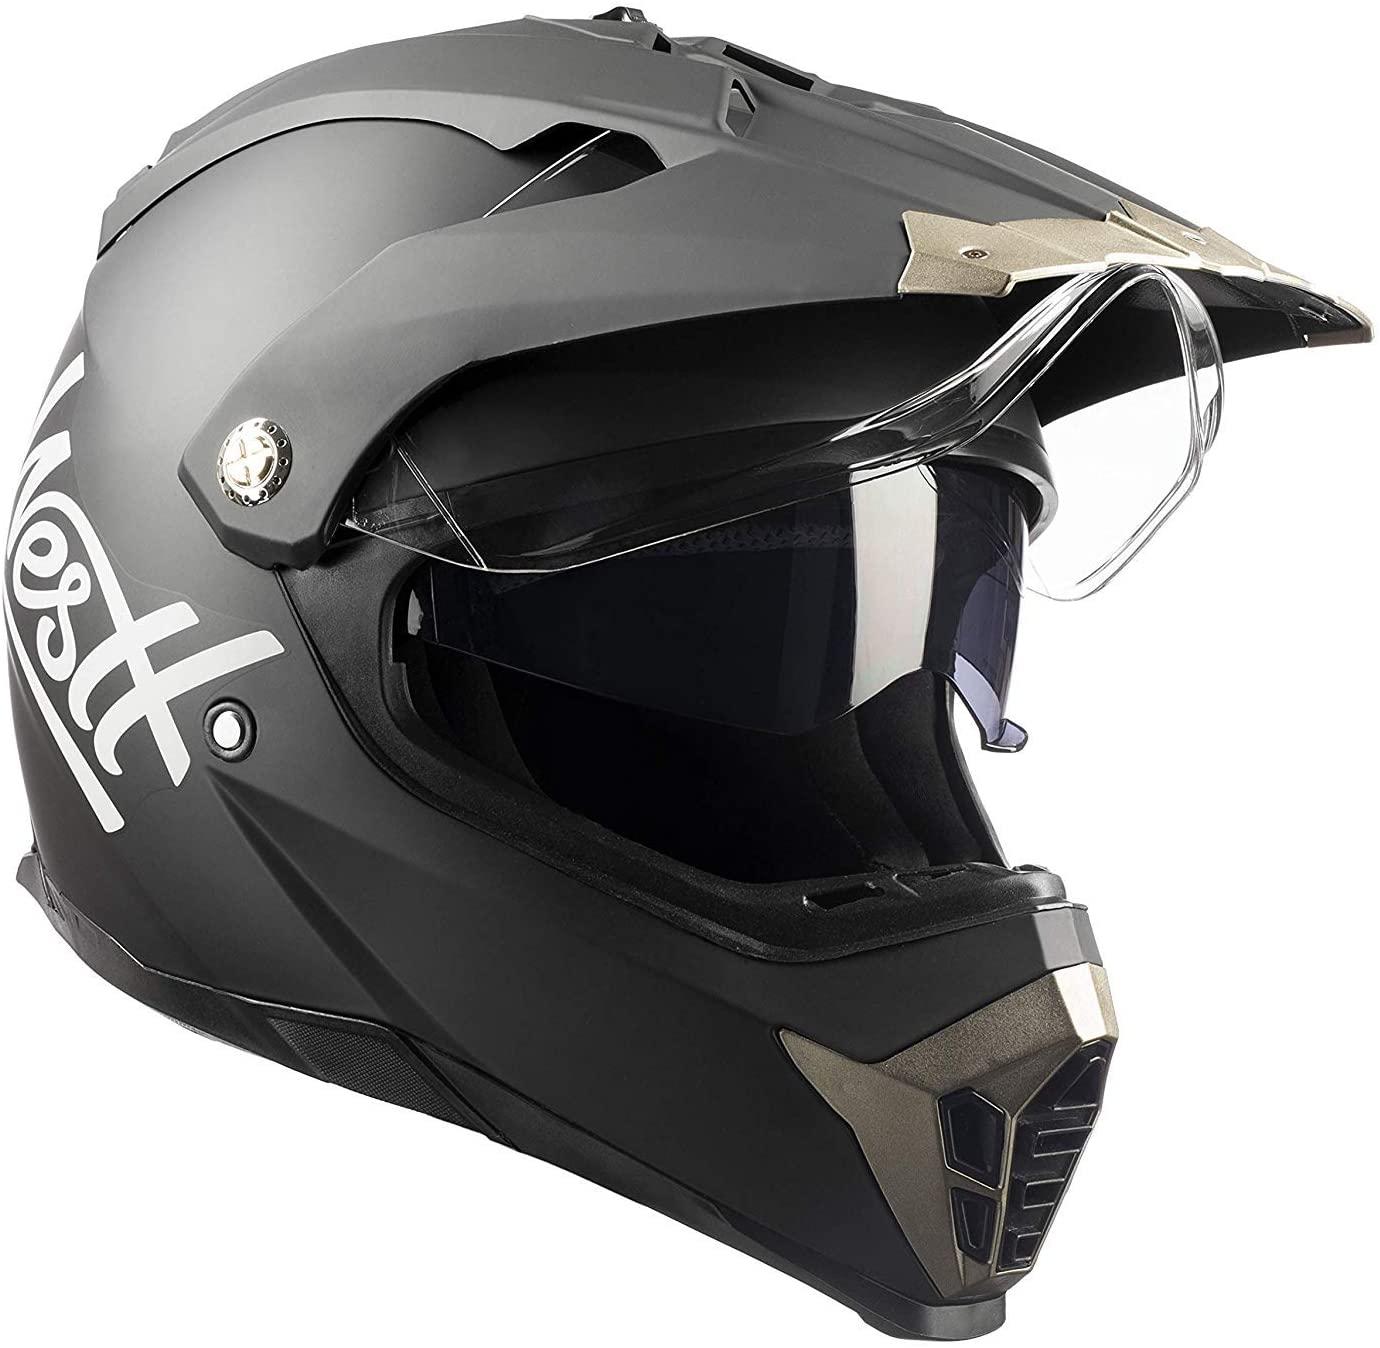 Casco Motocross Integrale Nero Opaco Doppia Visiera